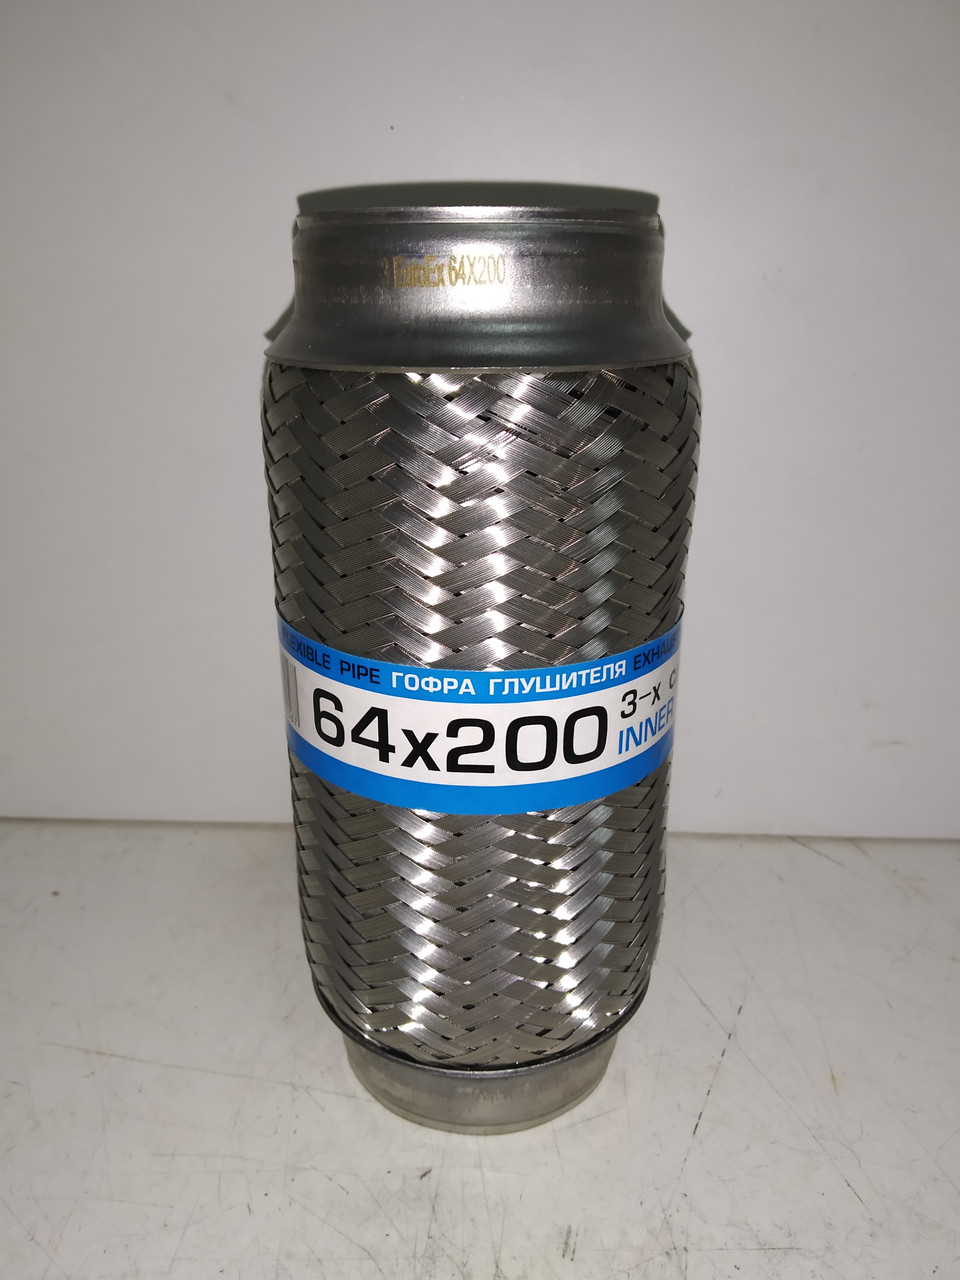 Гофра глушника Euroex 64х200 3-х шарова